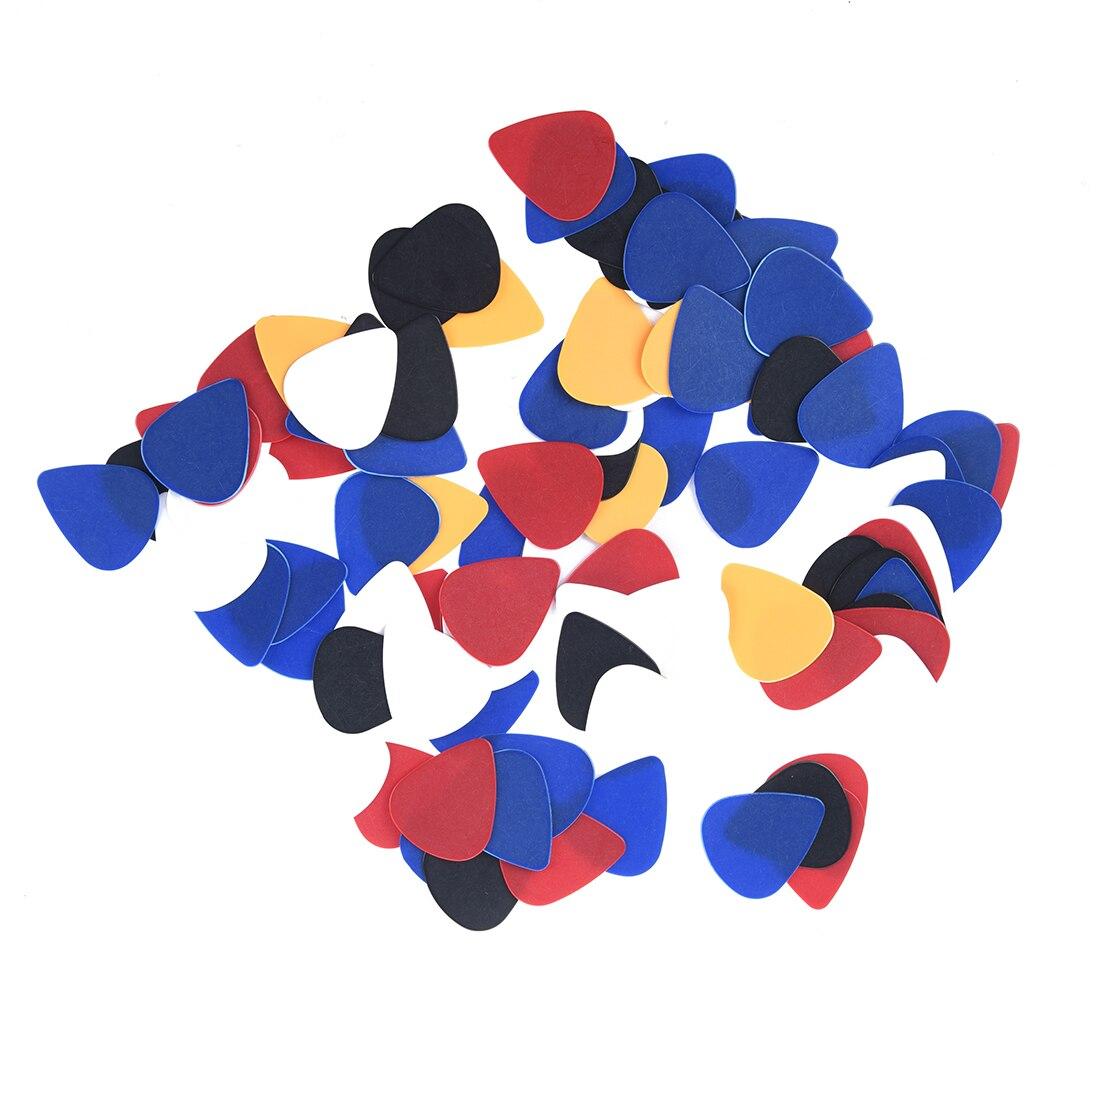 100pcs Plastik Plektren Plektren Ca Assorted zufaellige Farbe